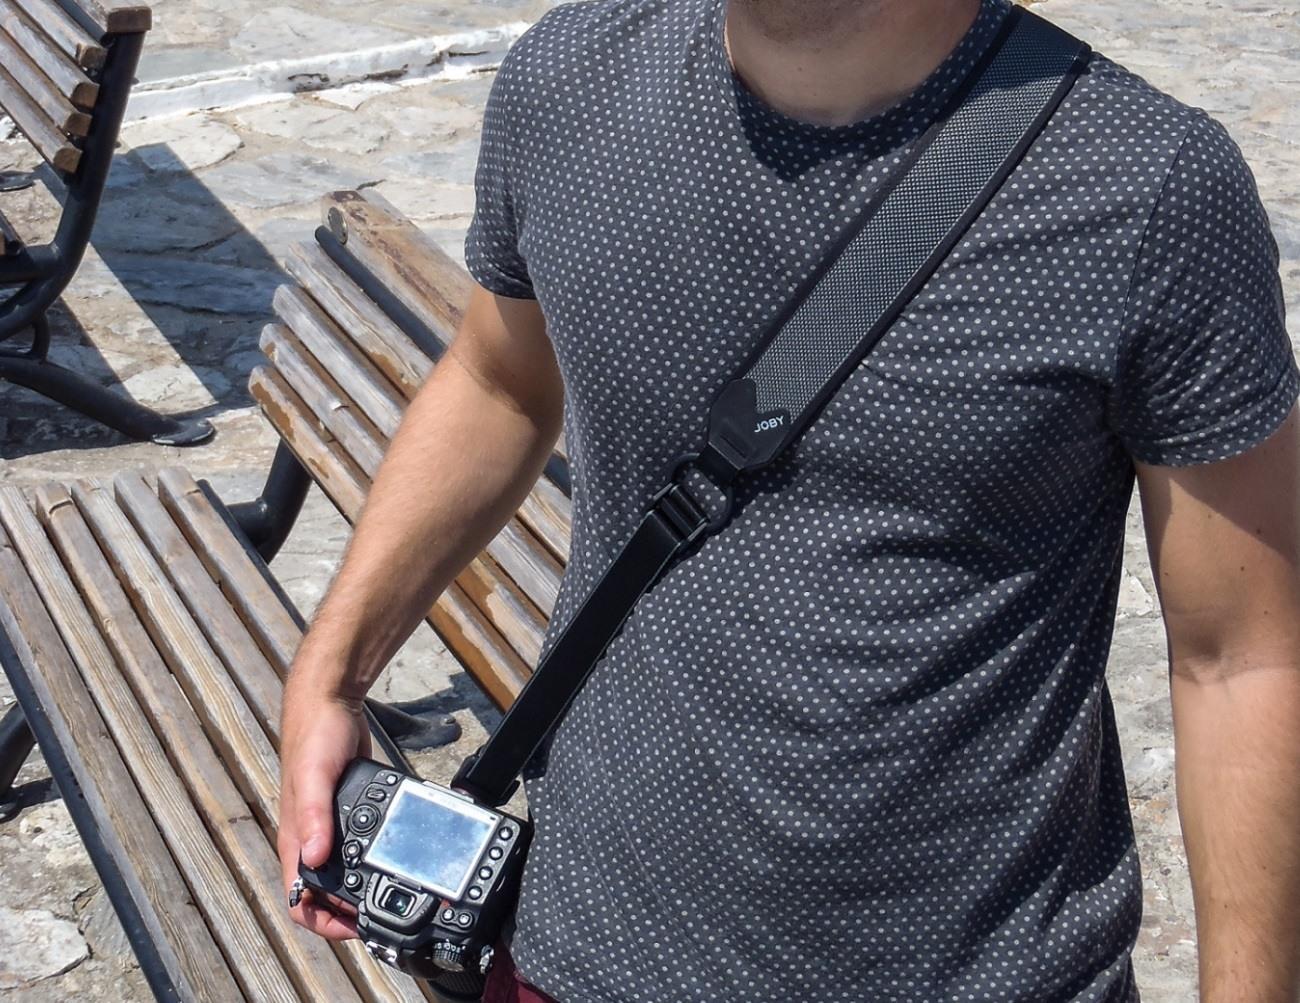 3-Way Camera Strap By Joby